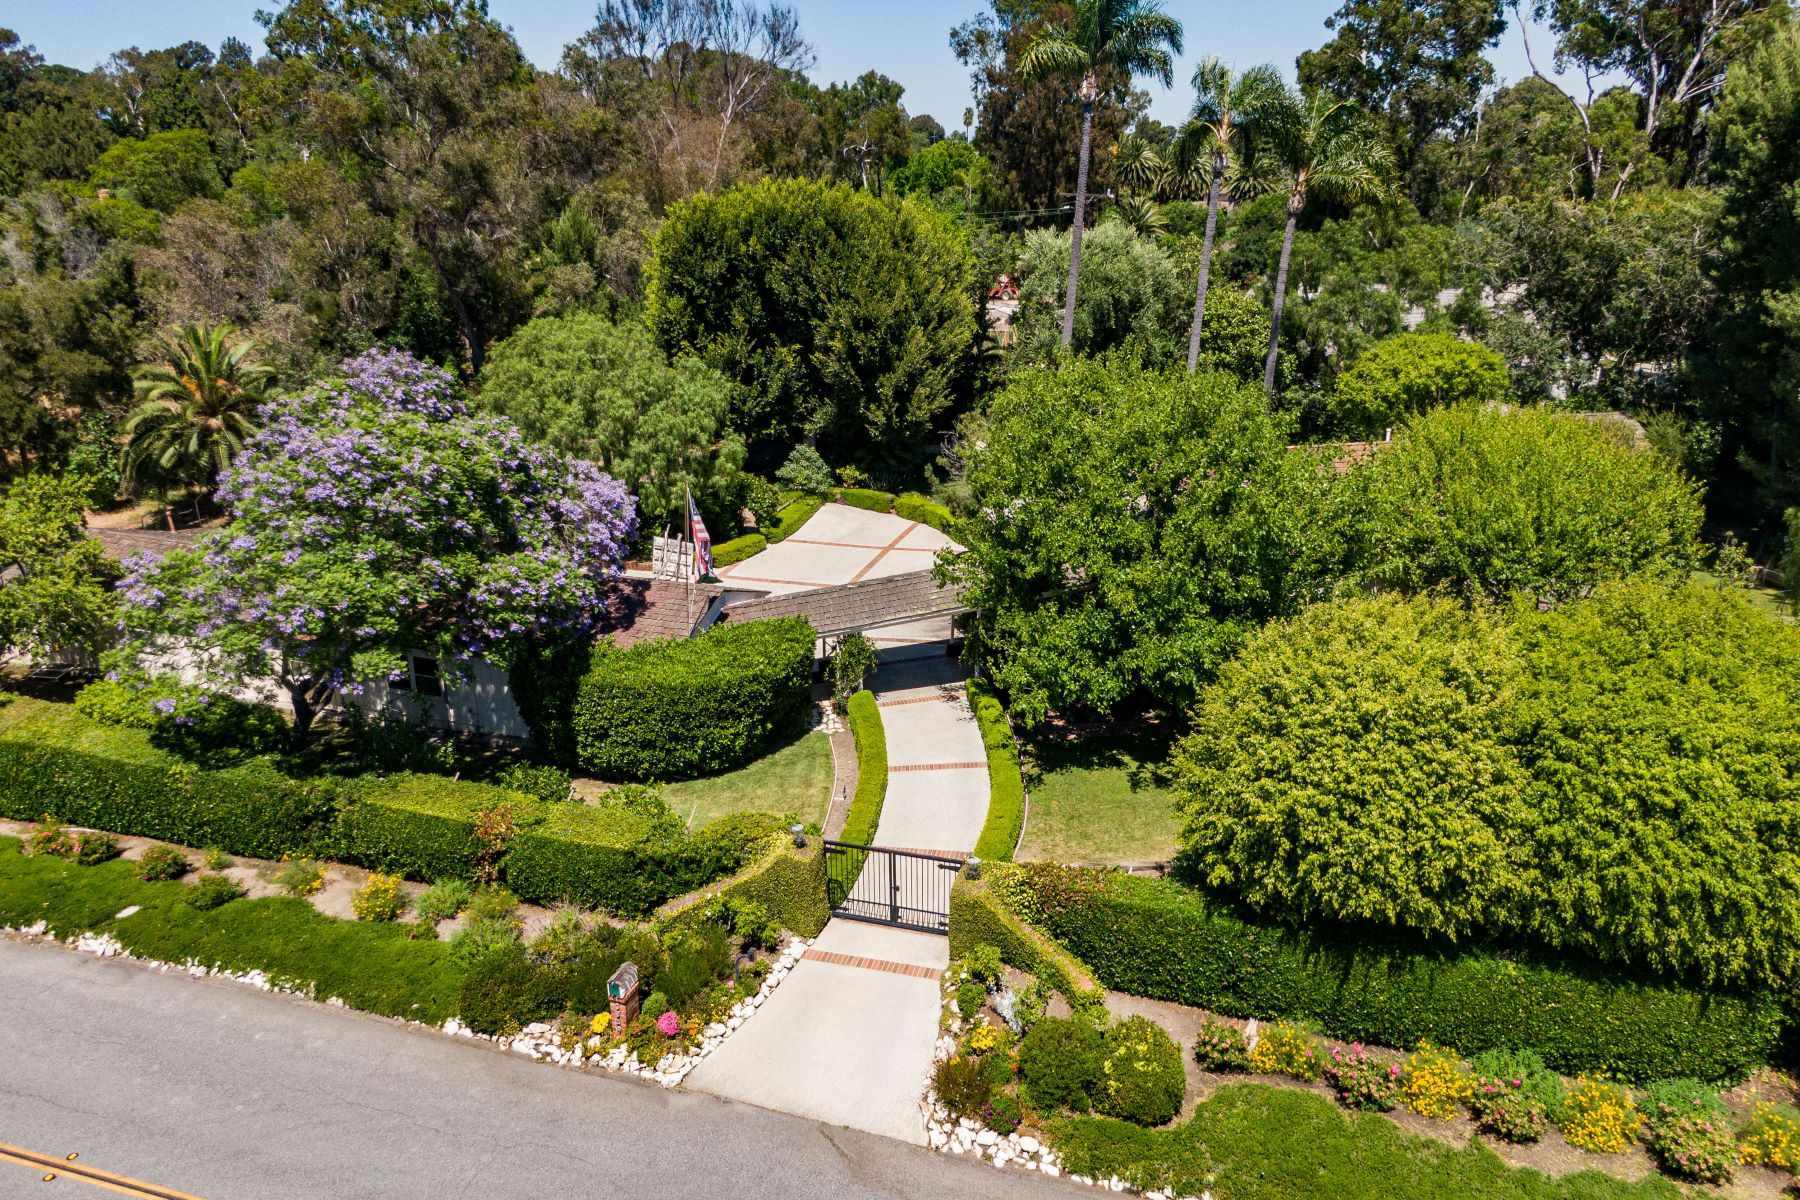 Single Family Homes for Sale at 3849 Paseo Del Campo, Palos Verdes Estates, CA 90274 3849 Paseo Del Campo Palos Verdes Estates, California 90274 United States